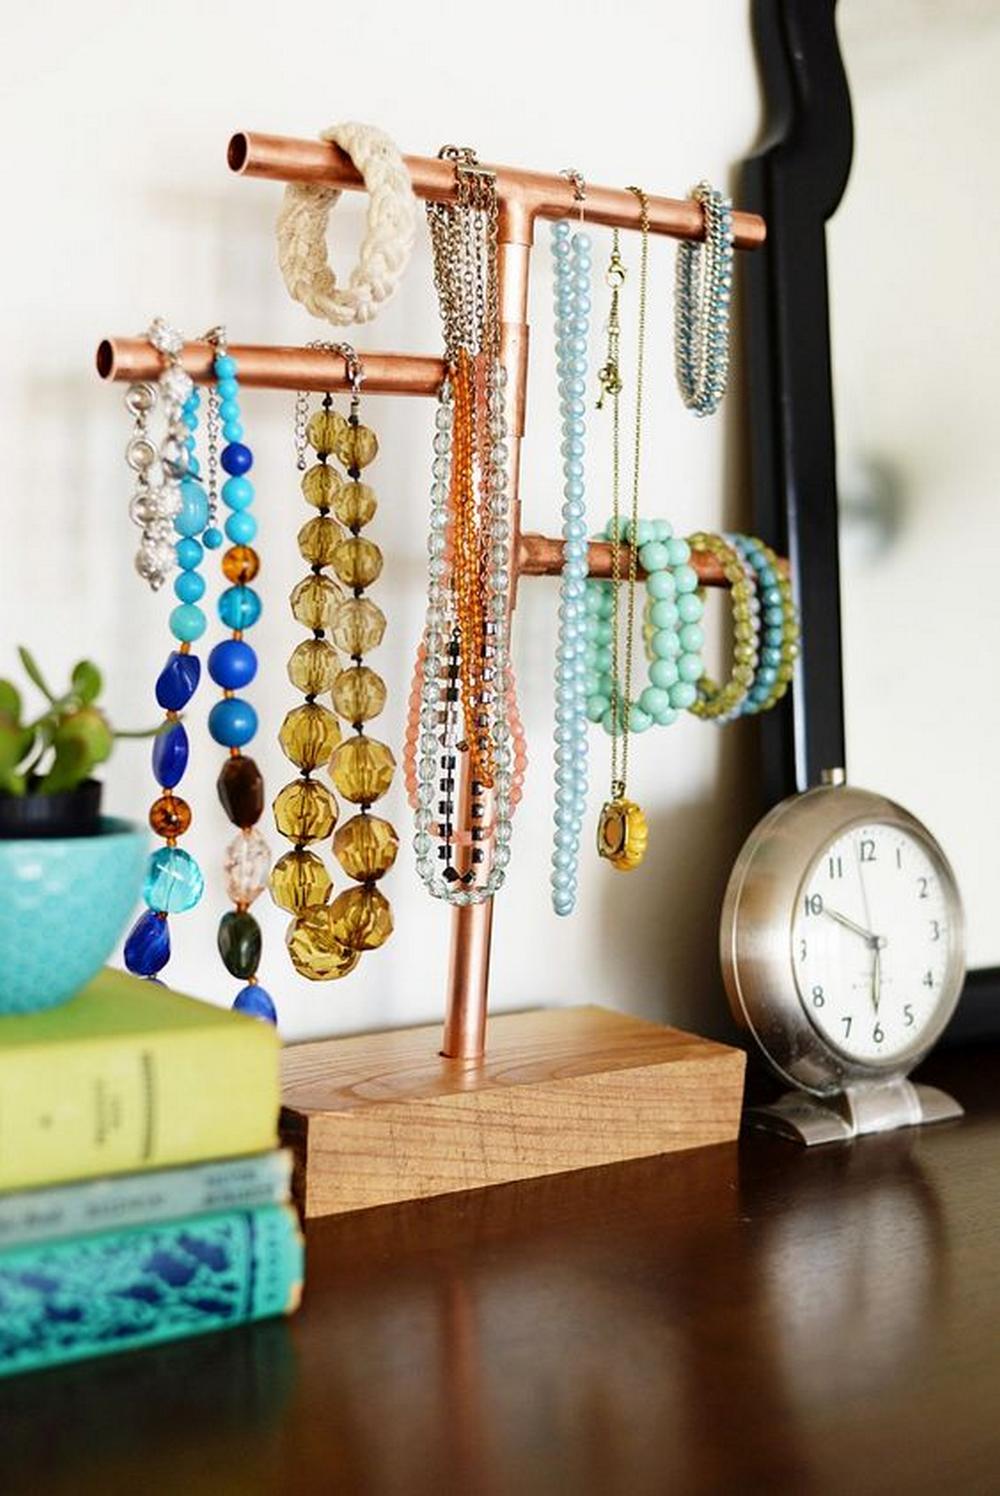 DIY Copper Pipe Jewelry Organizer